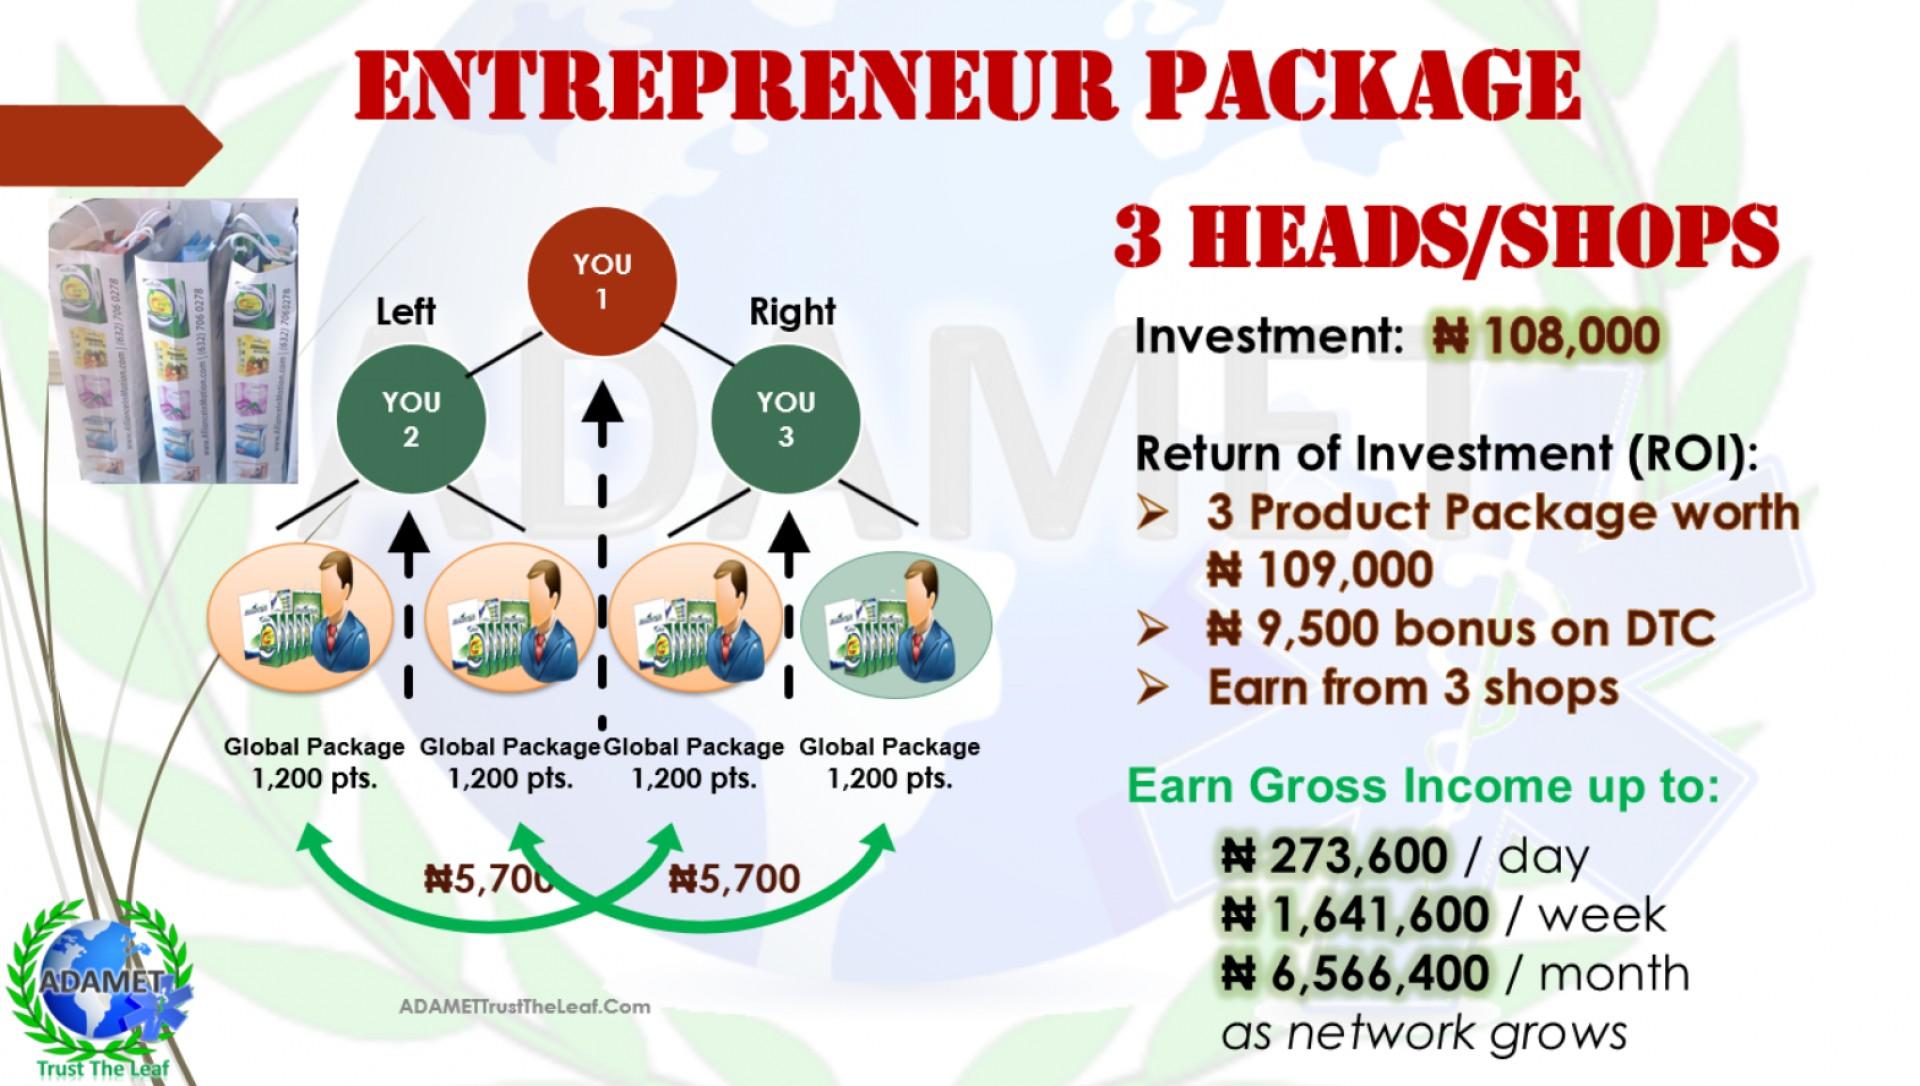 002 Aim Global Networking Marketing Plan Lazy Man Scenario Of.